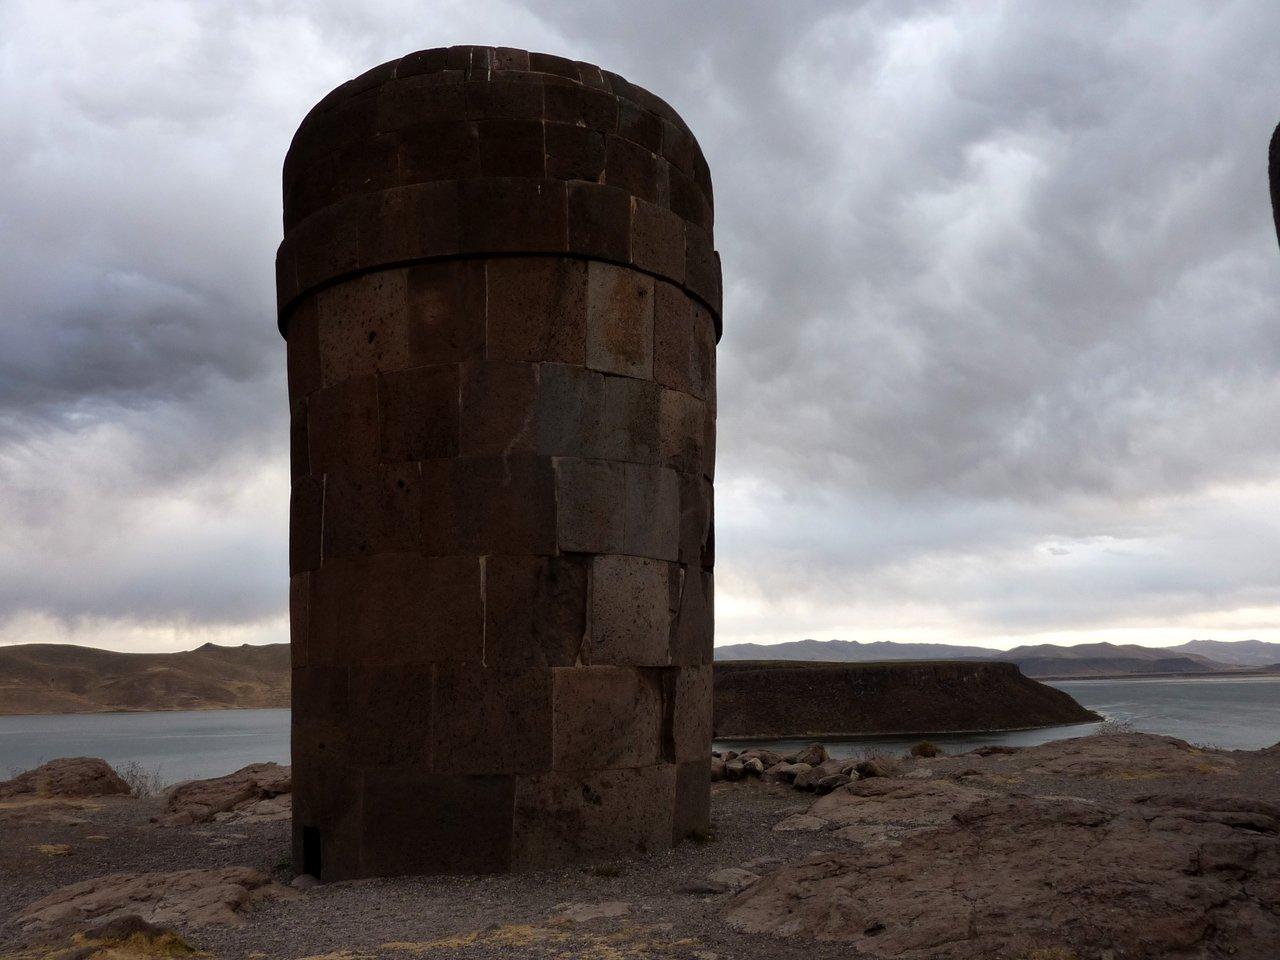 lago titicaca fai da te: chullpas a sillustani